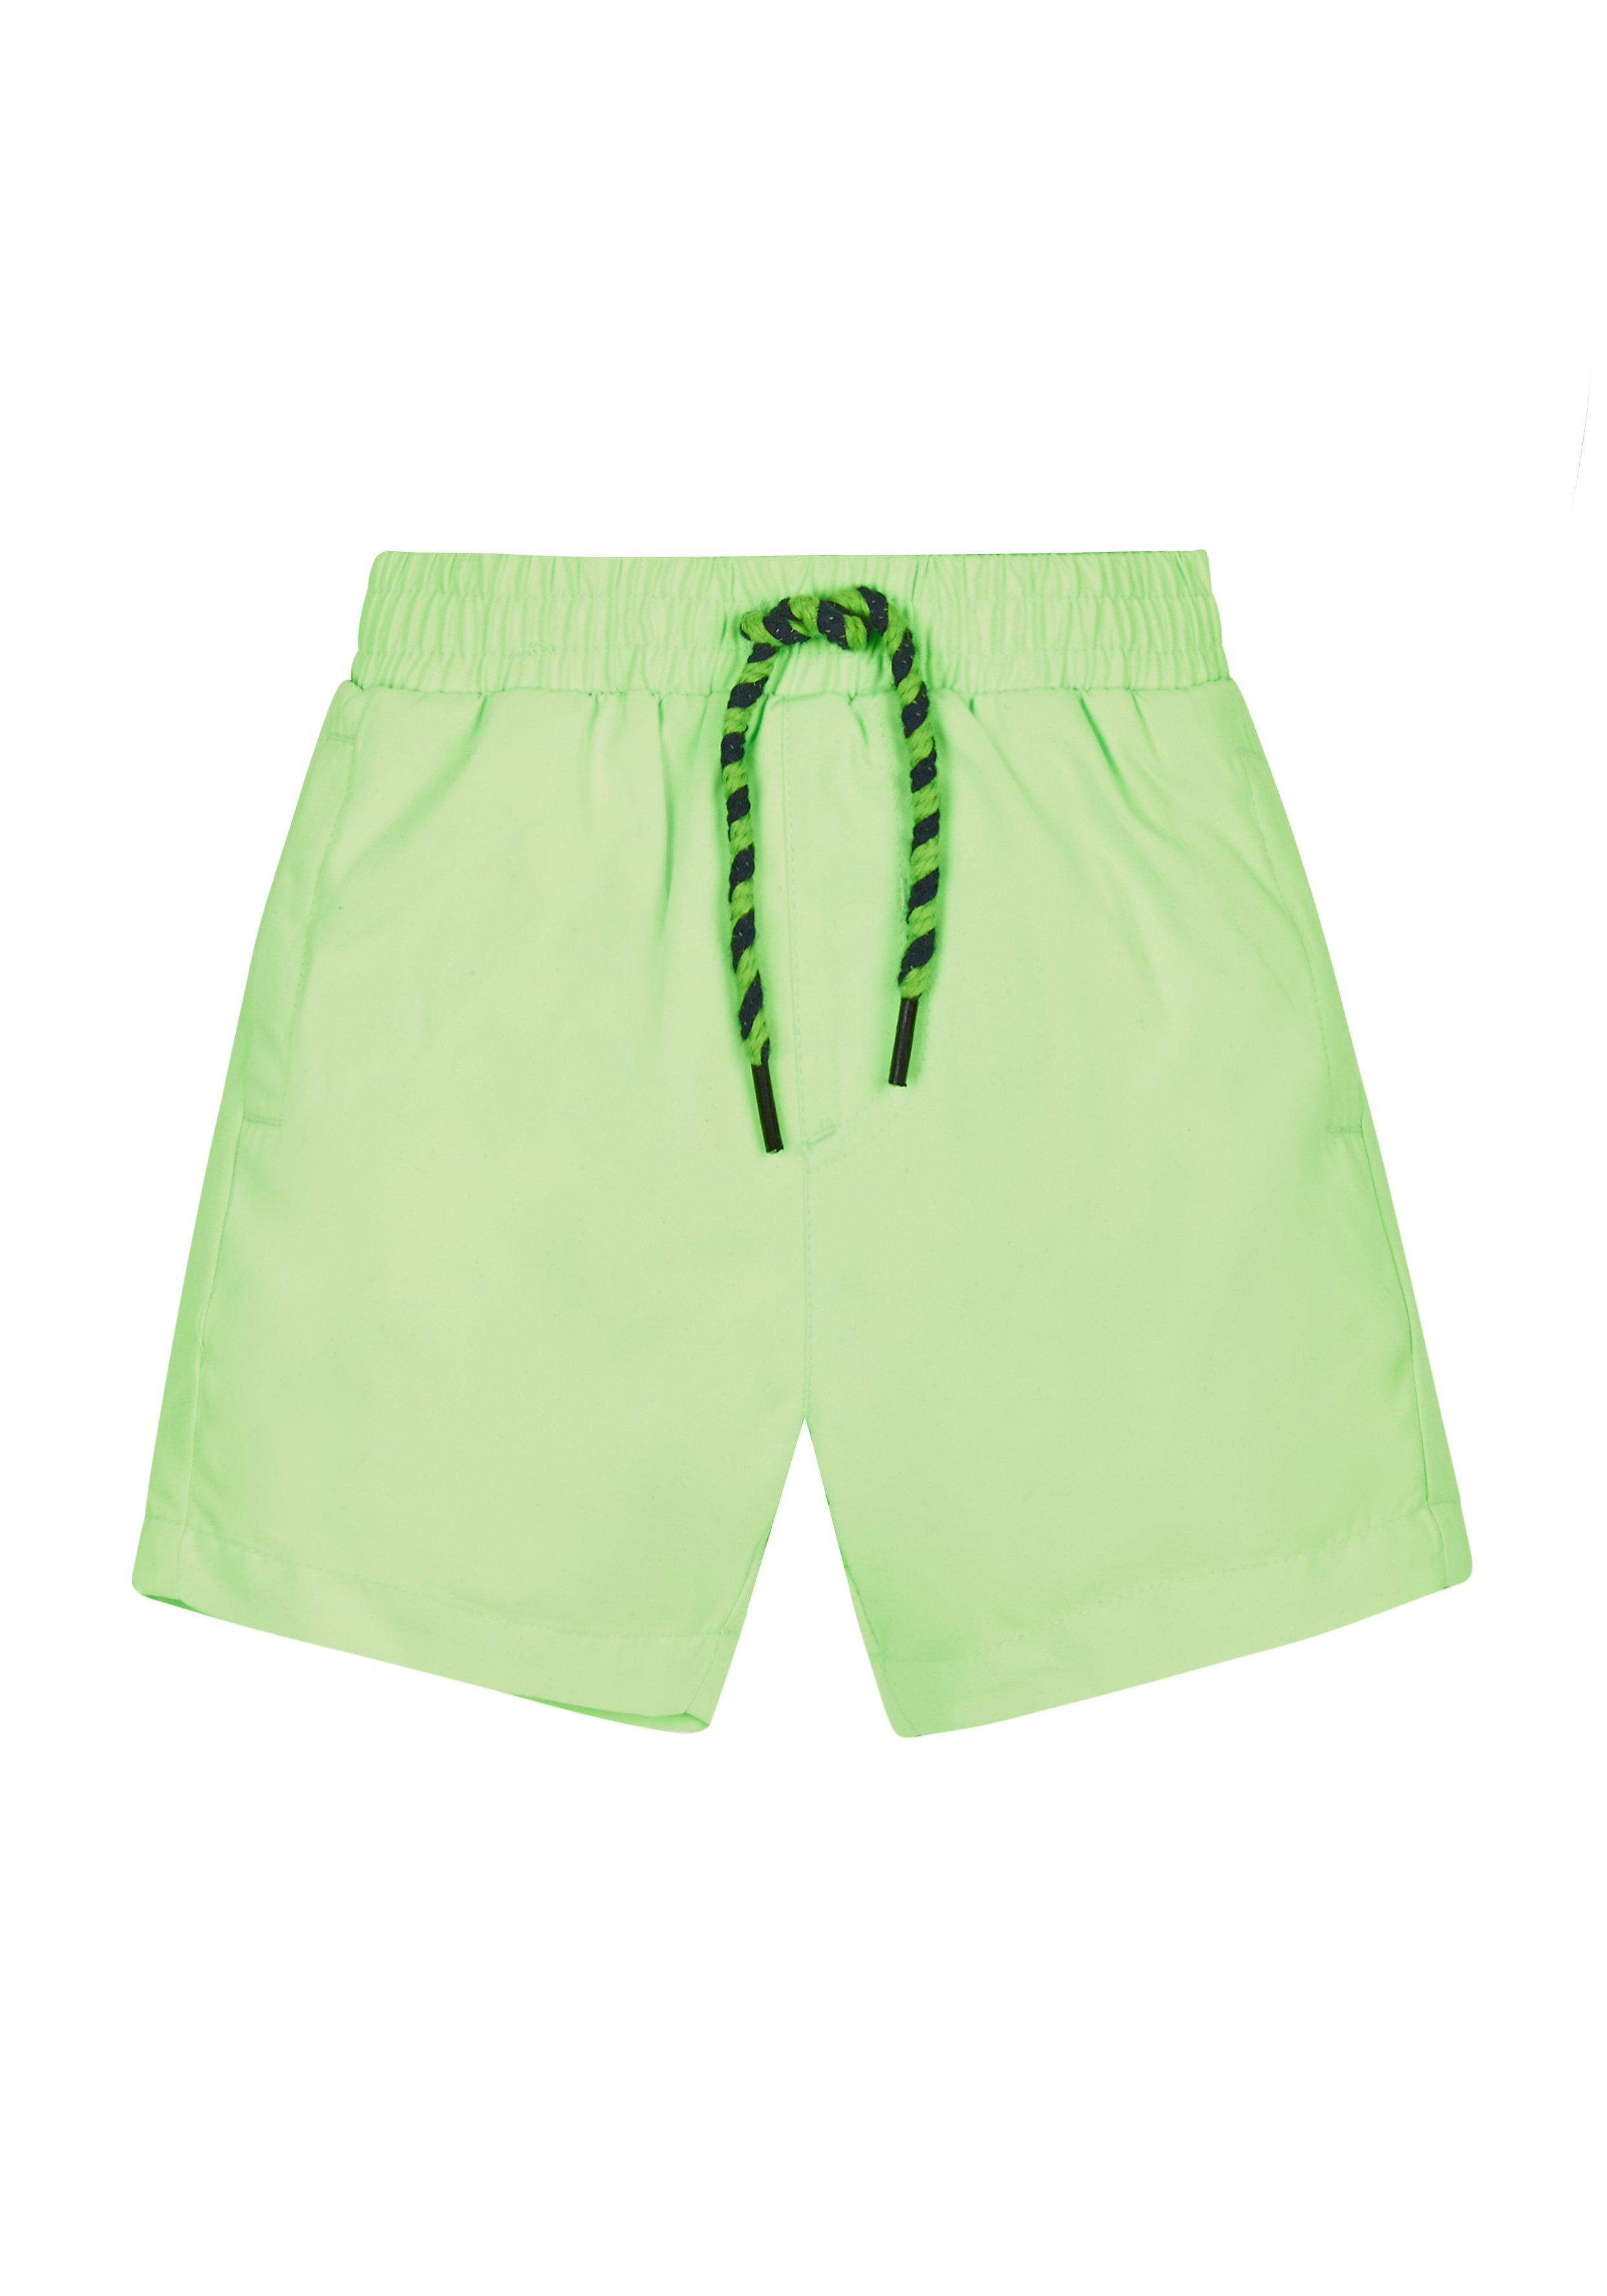 Mothercare | Boys Swimming Shorts - Green